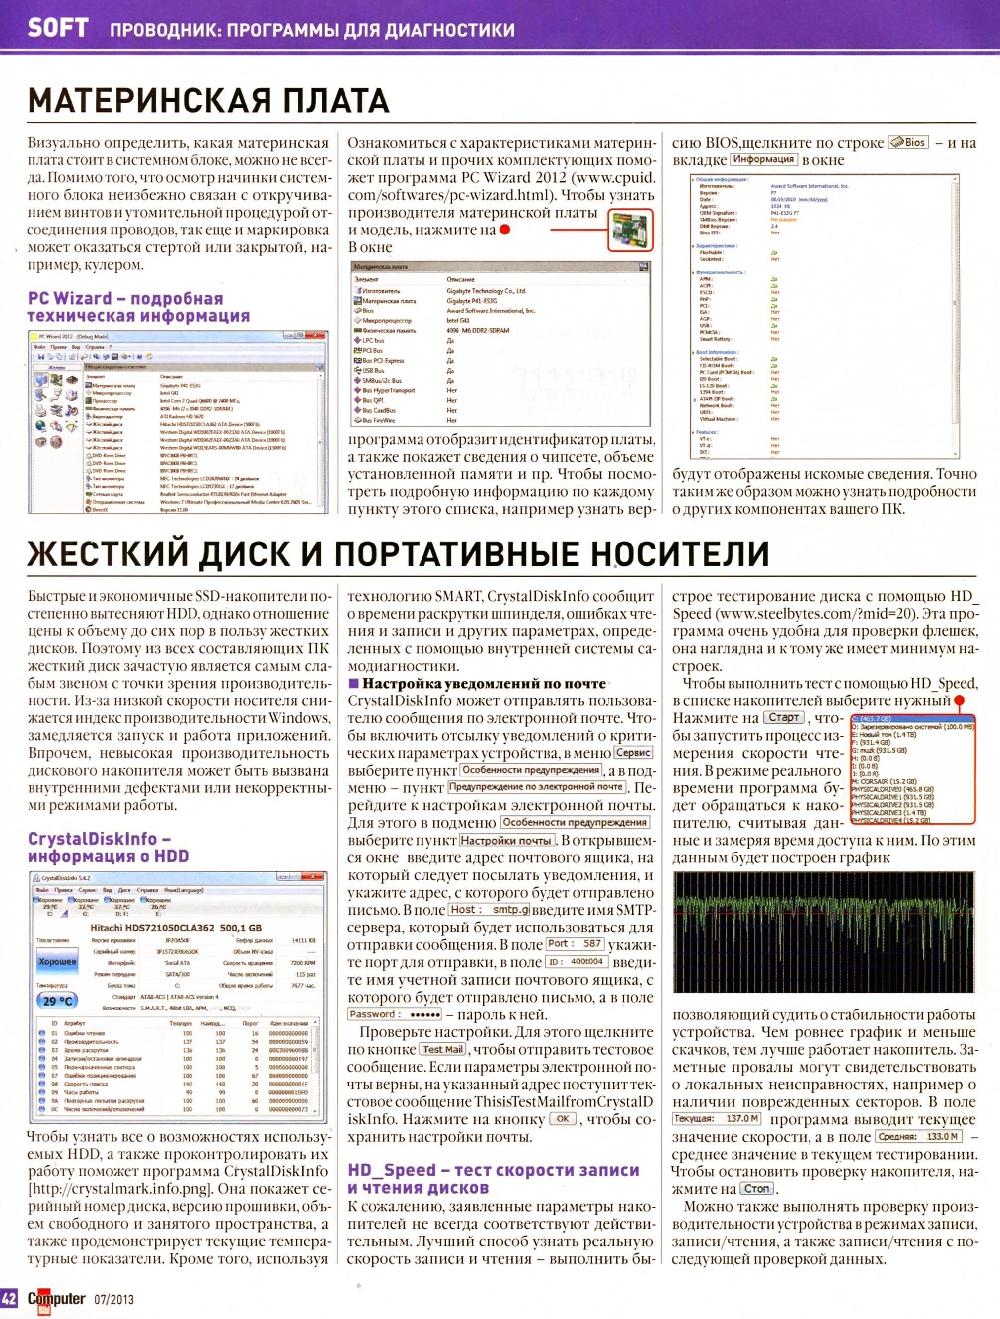 http://s6.hostingkartinok.com/uploads/images/2013/09/4d4697ceccdd6cddd5c501b95c497e7f.jpg